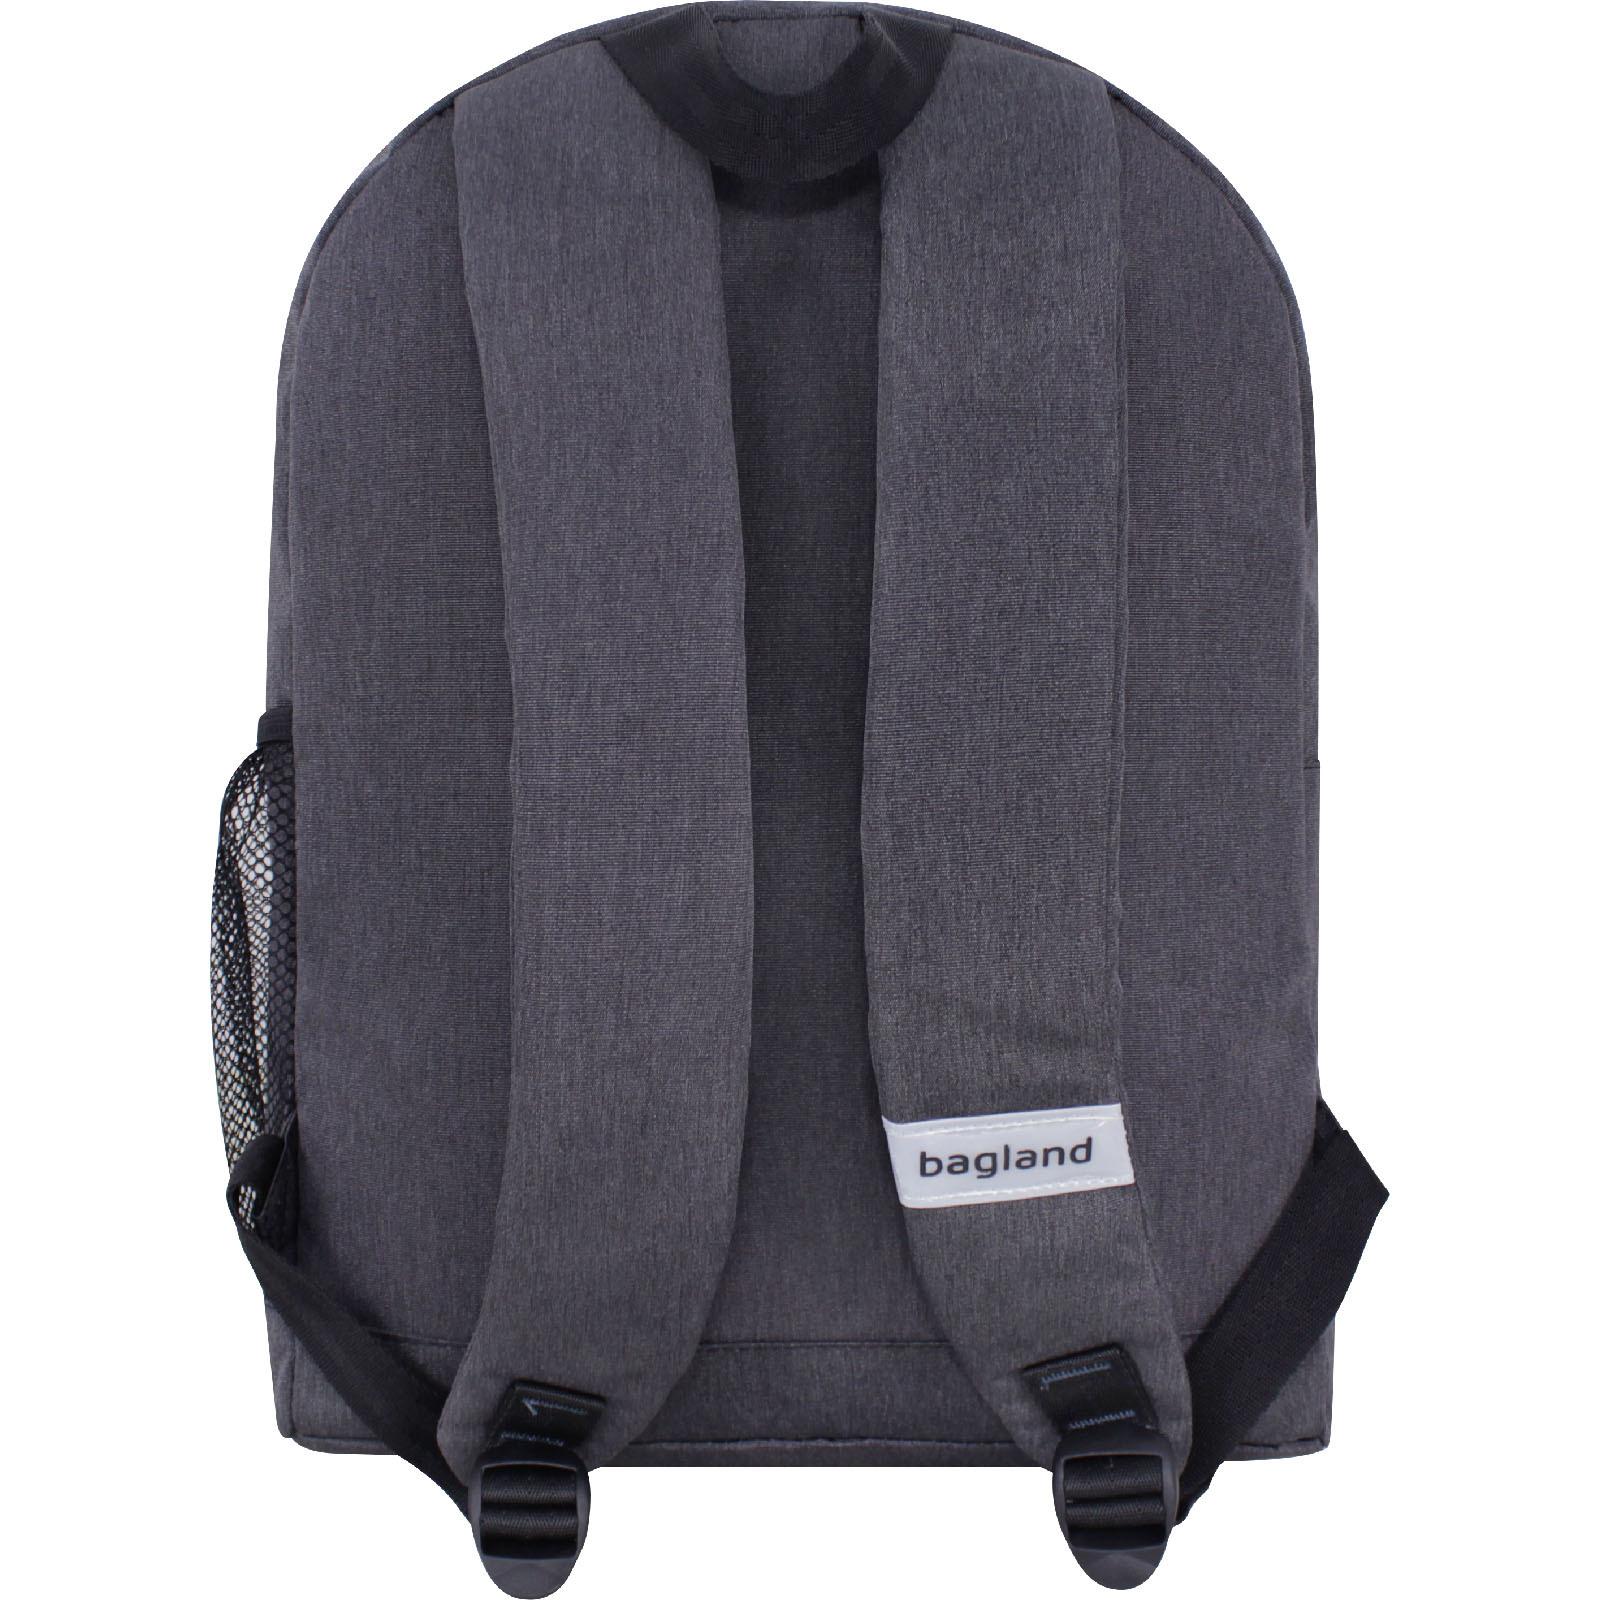 Рюкзак Bagland Молодежный меланж 17 л. Темно серый (00533692)